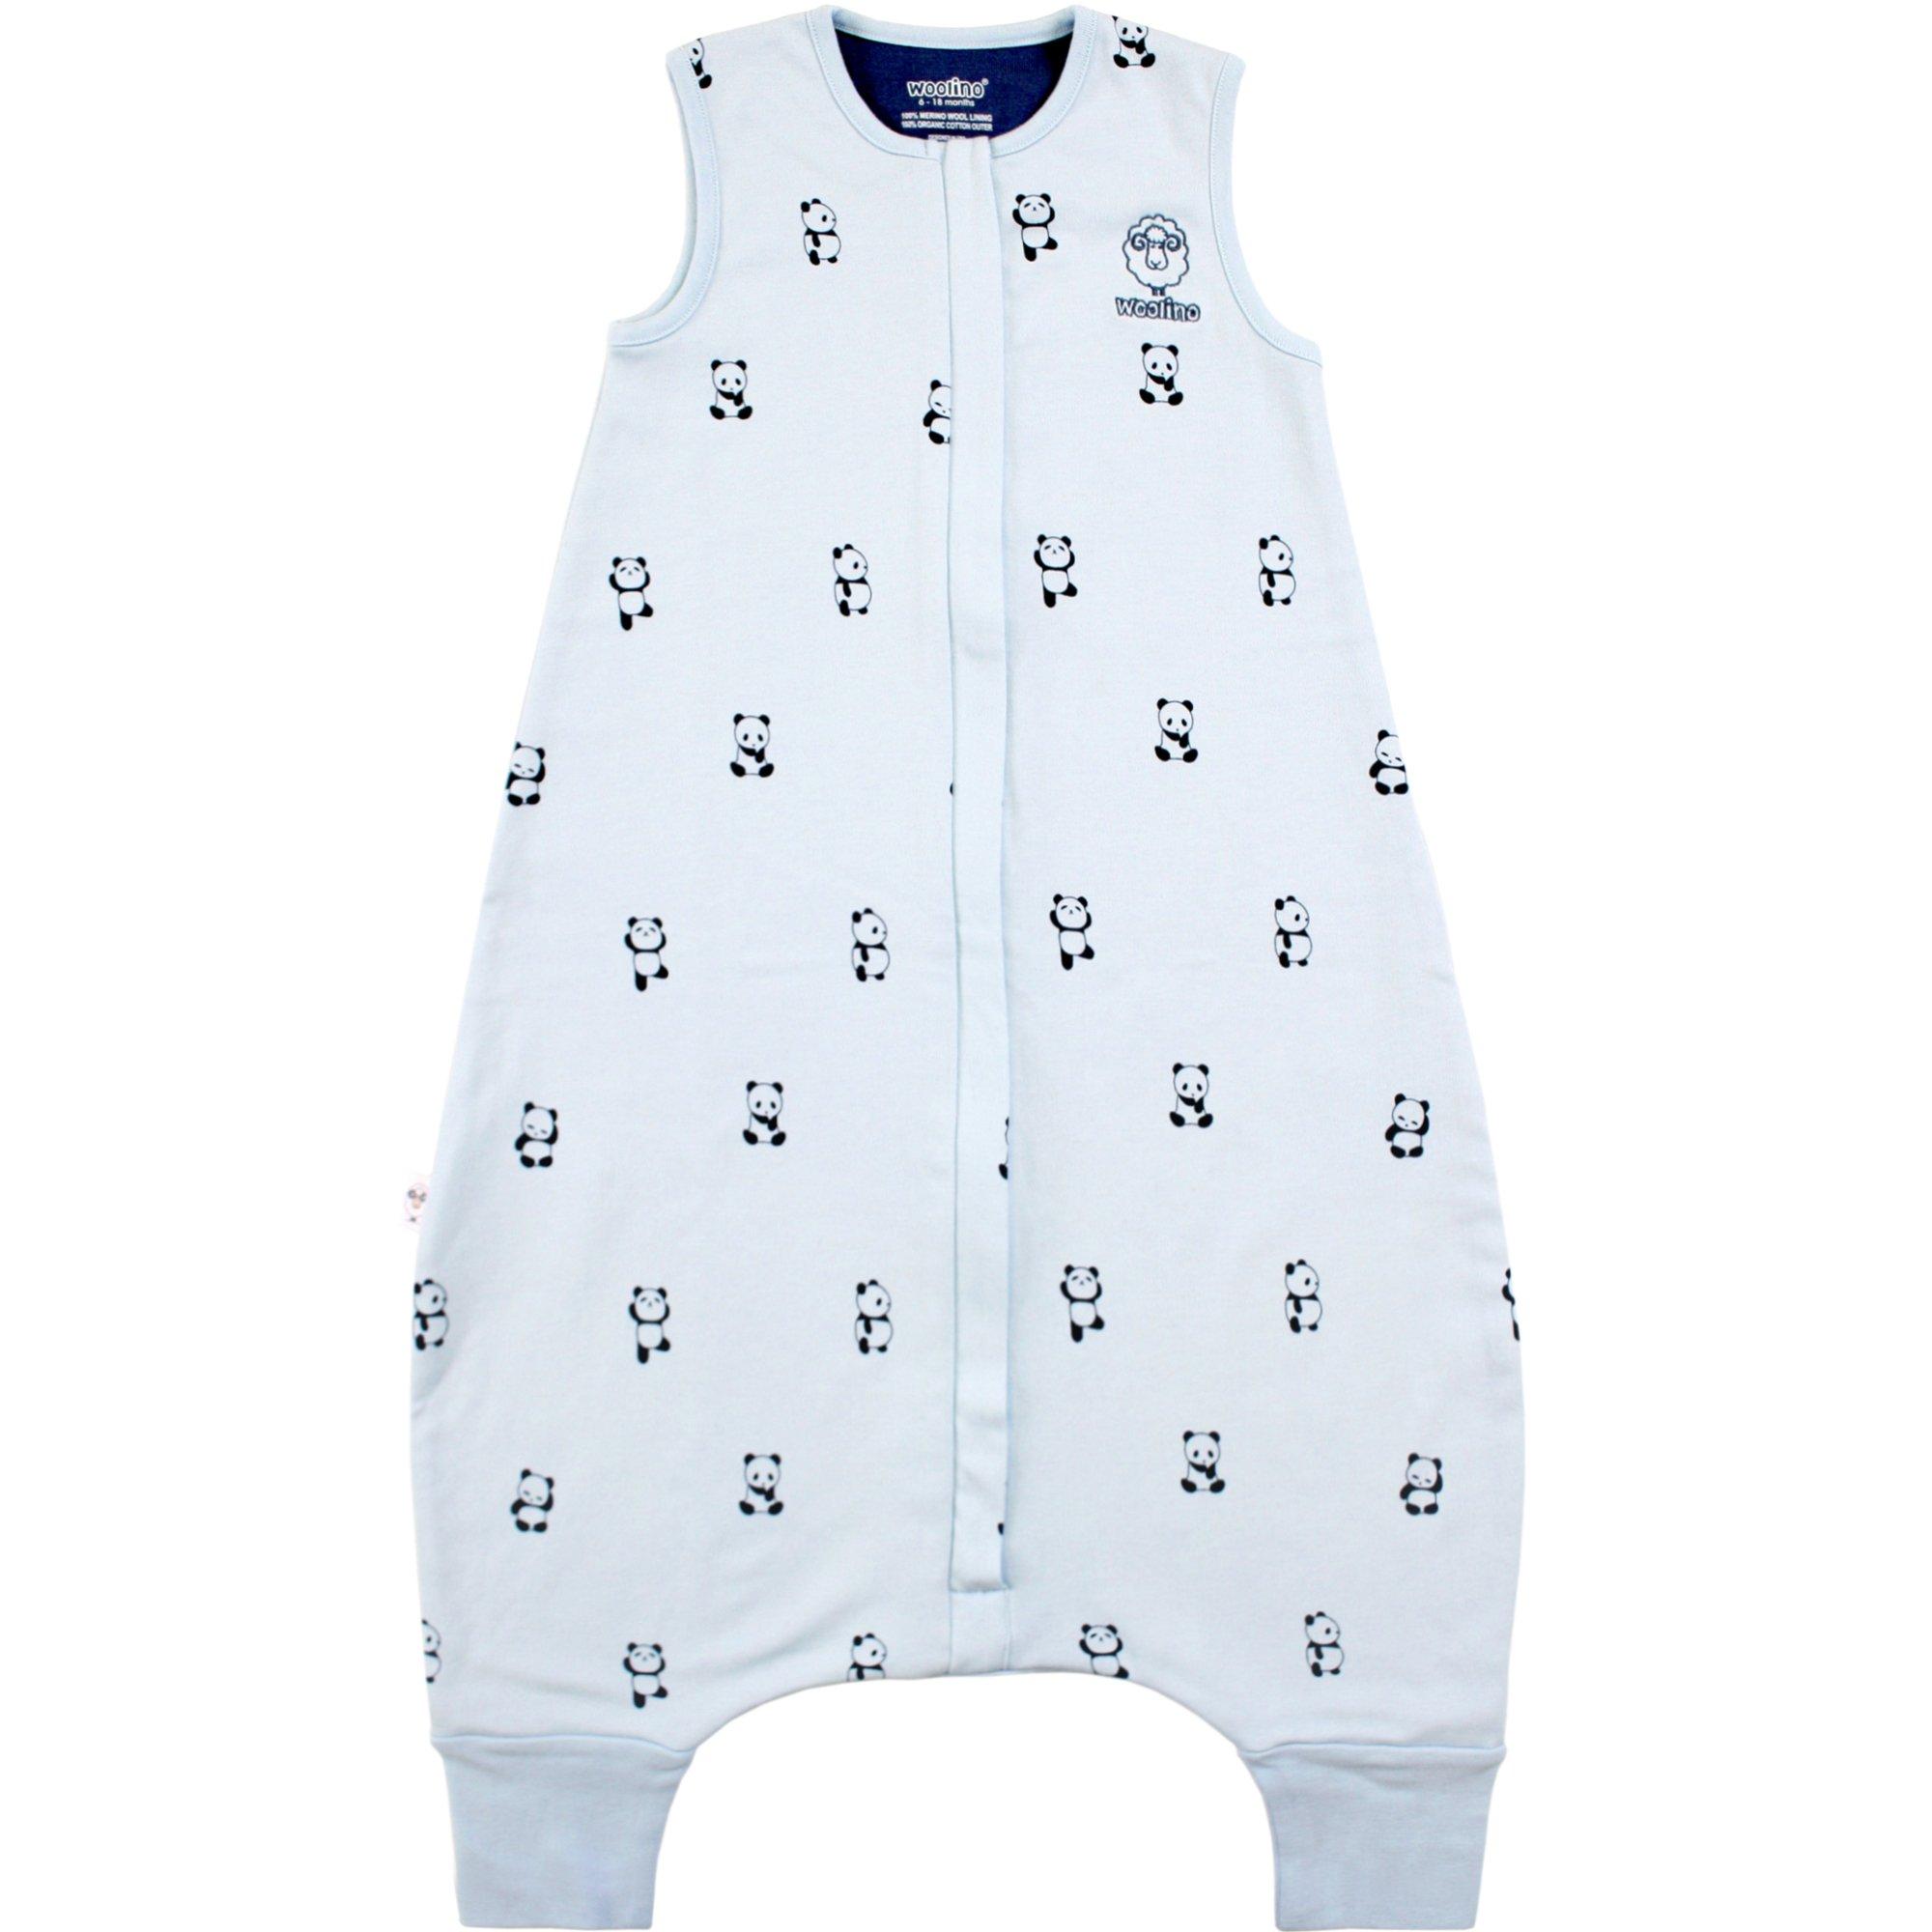 Woolino 4 Season Baby Sleep Bag with feet, Australian Merino Wool, 6-18m, Panda by Woolino